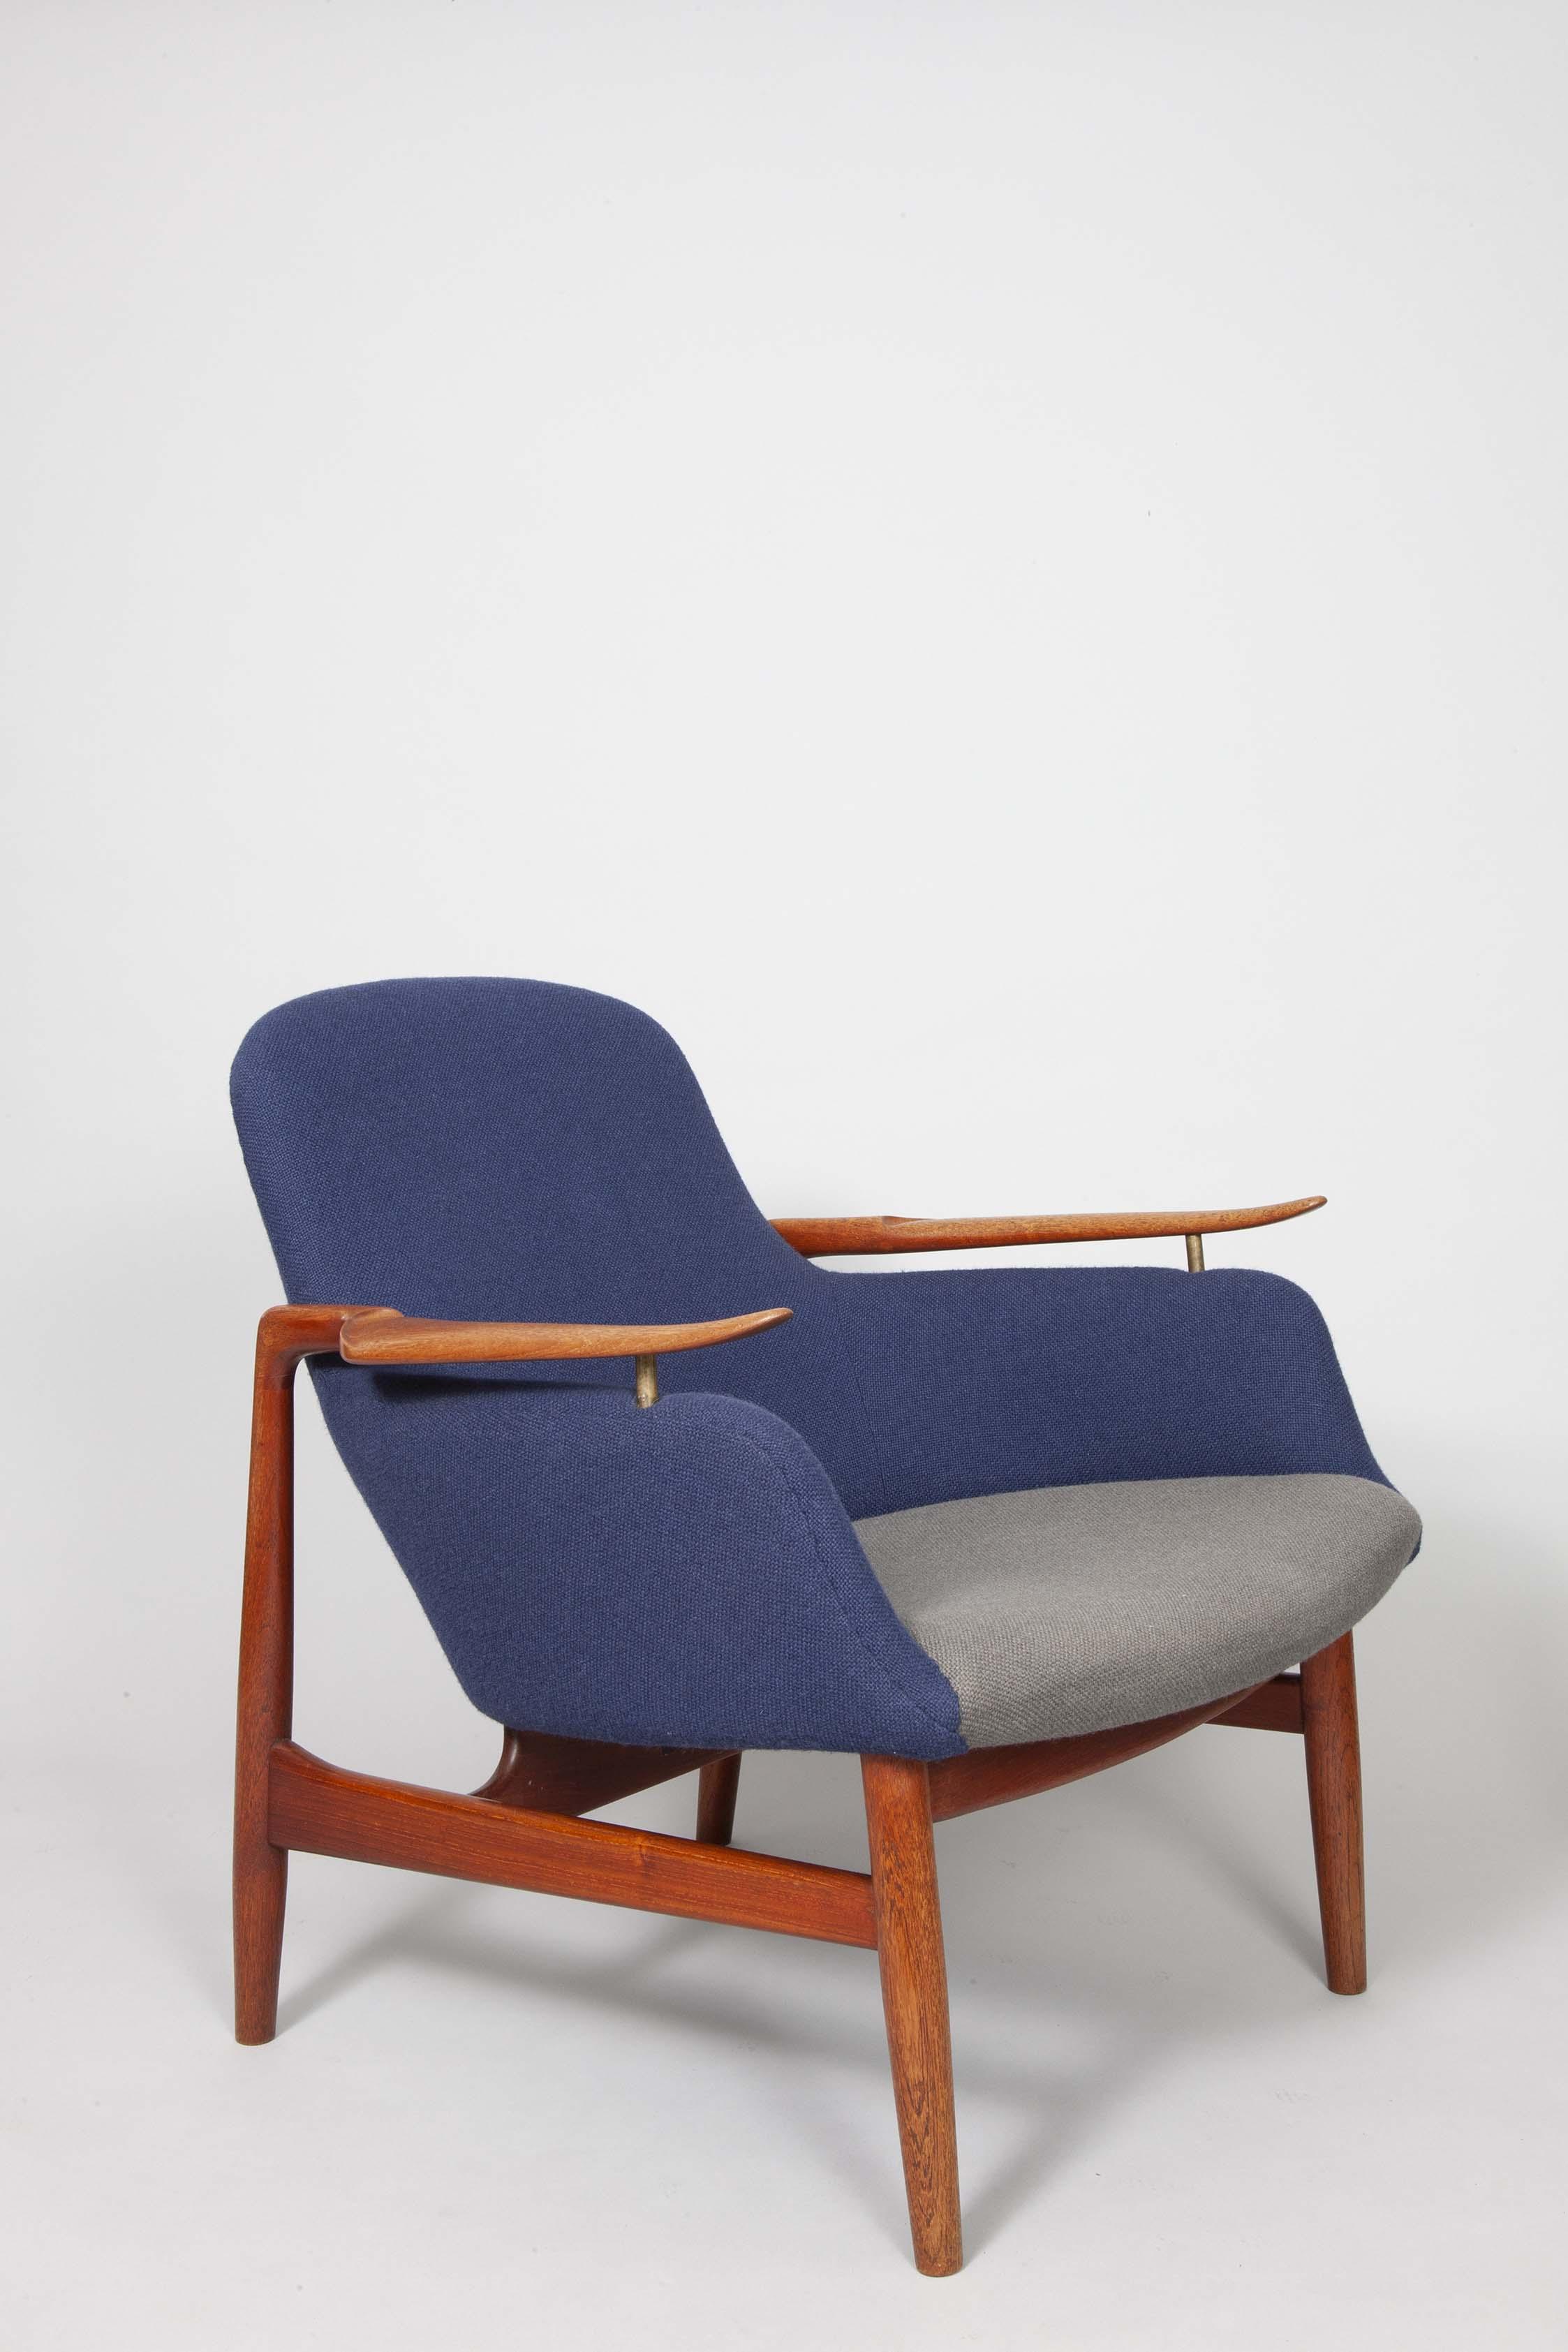 Finn Juhl armchairs